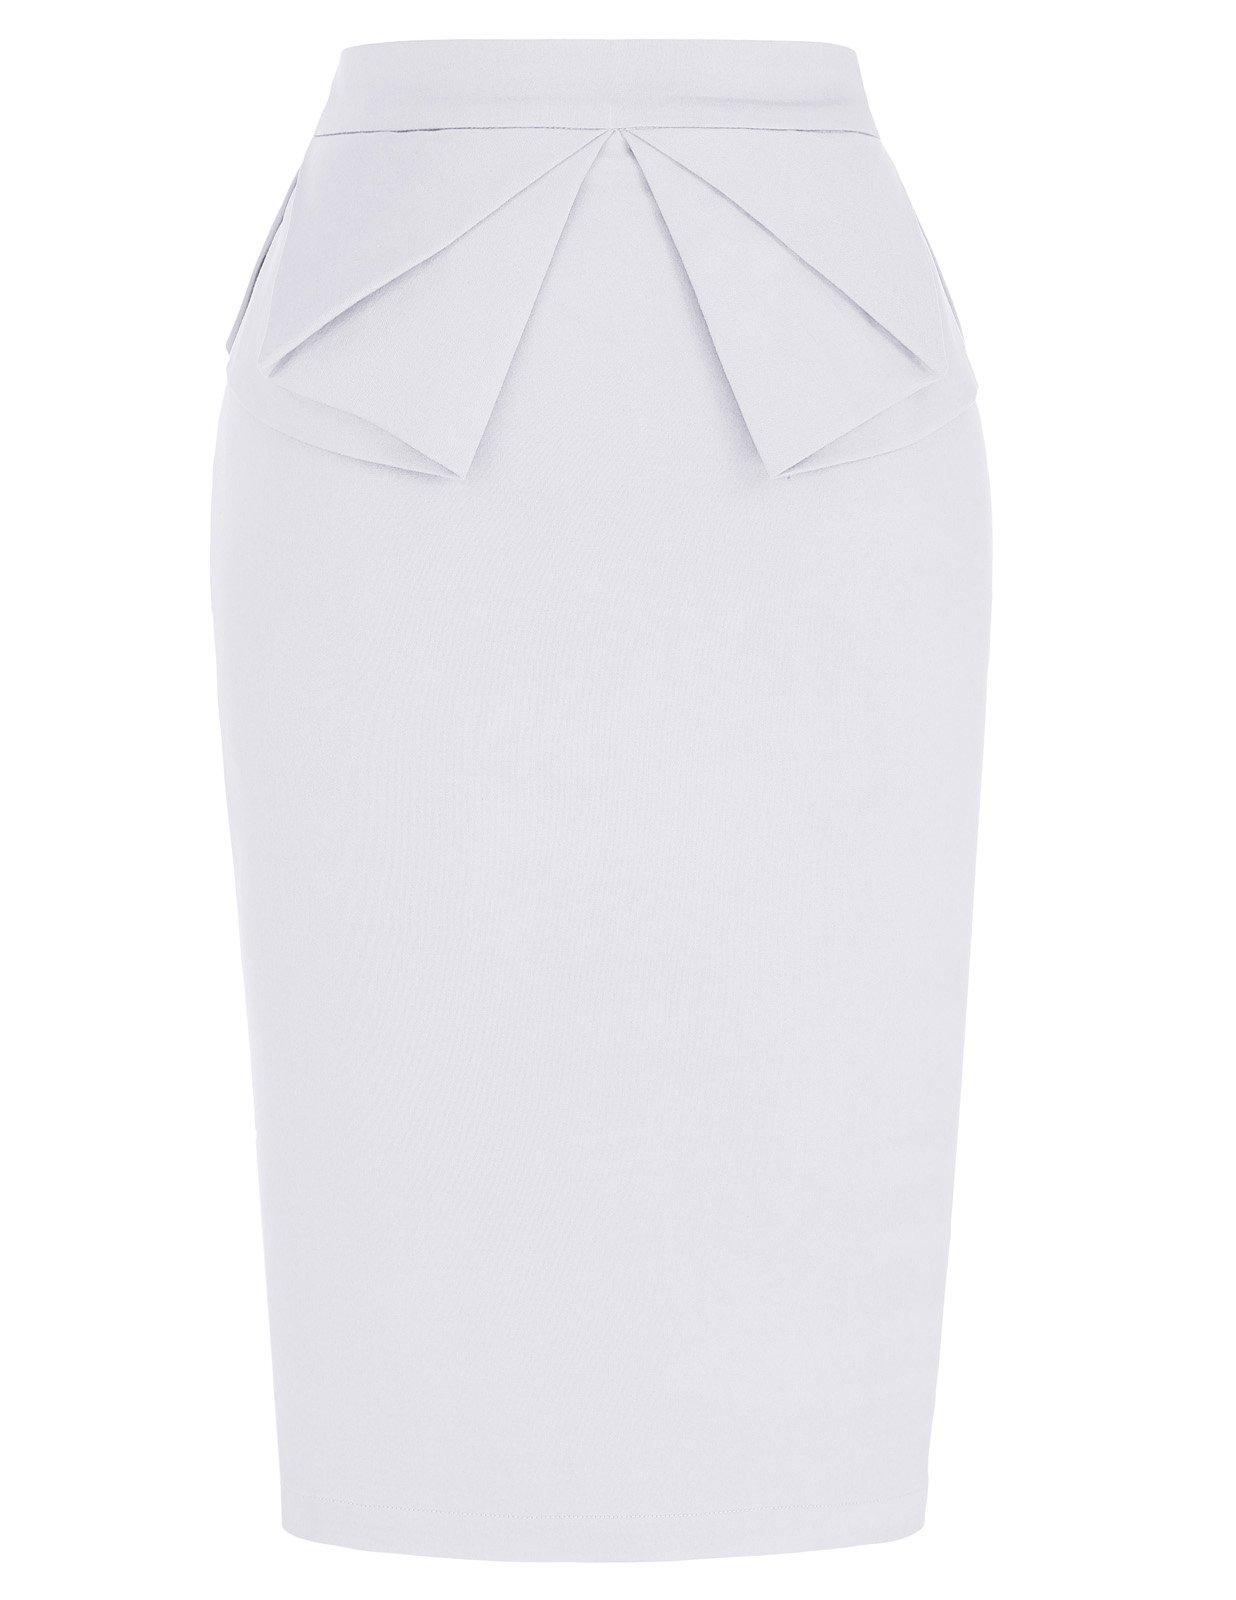 PrettyWorld Vintage Dress Solid Slim Stretchy Pencil Skirt for Women Knee Length White (M) KL-7 CL454